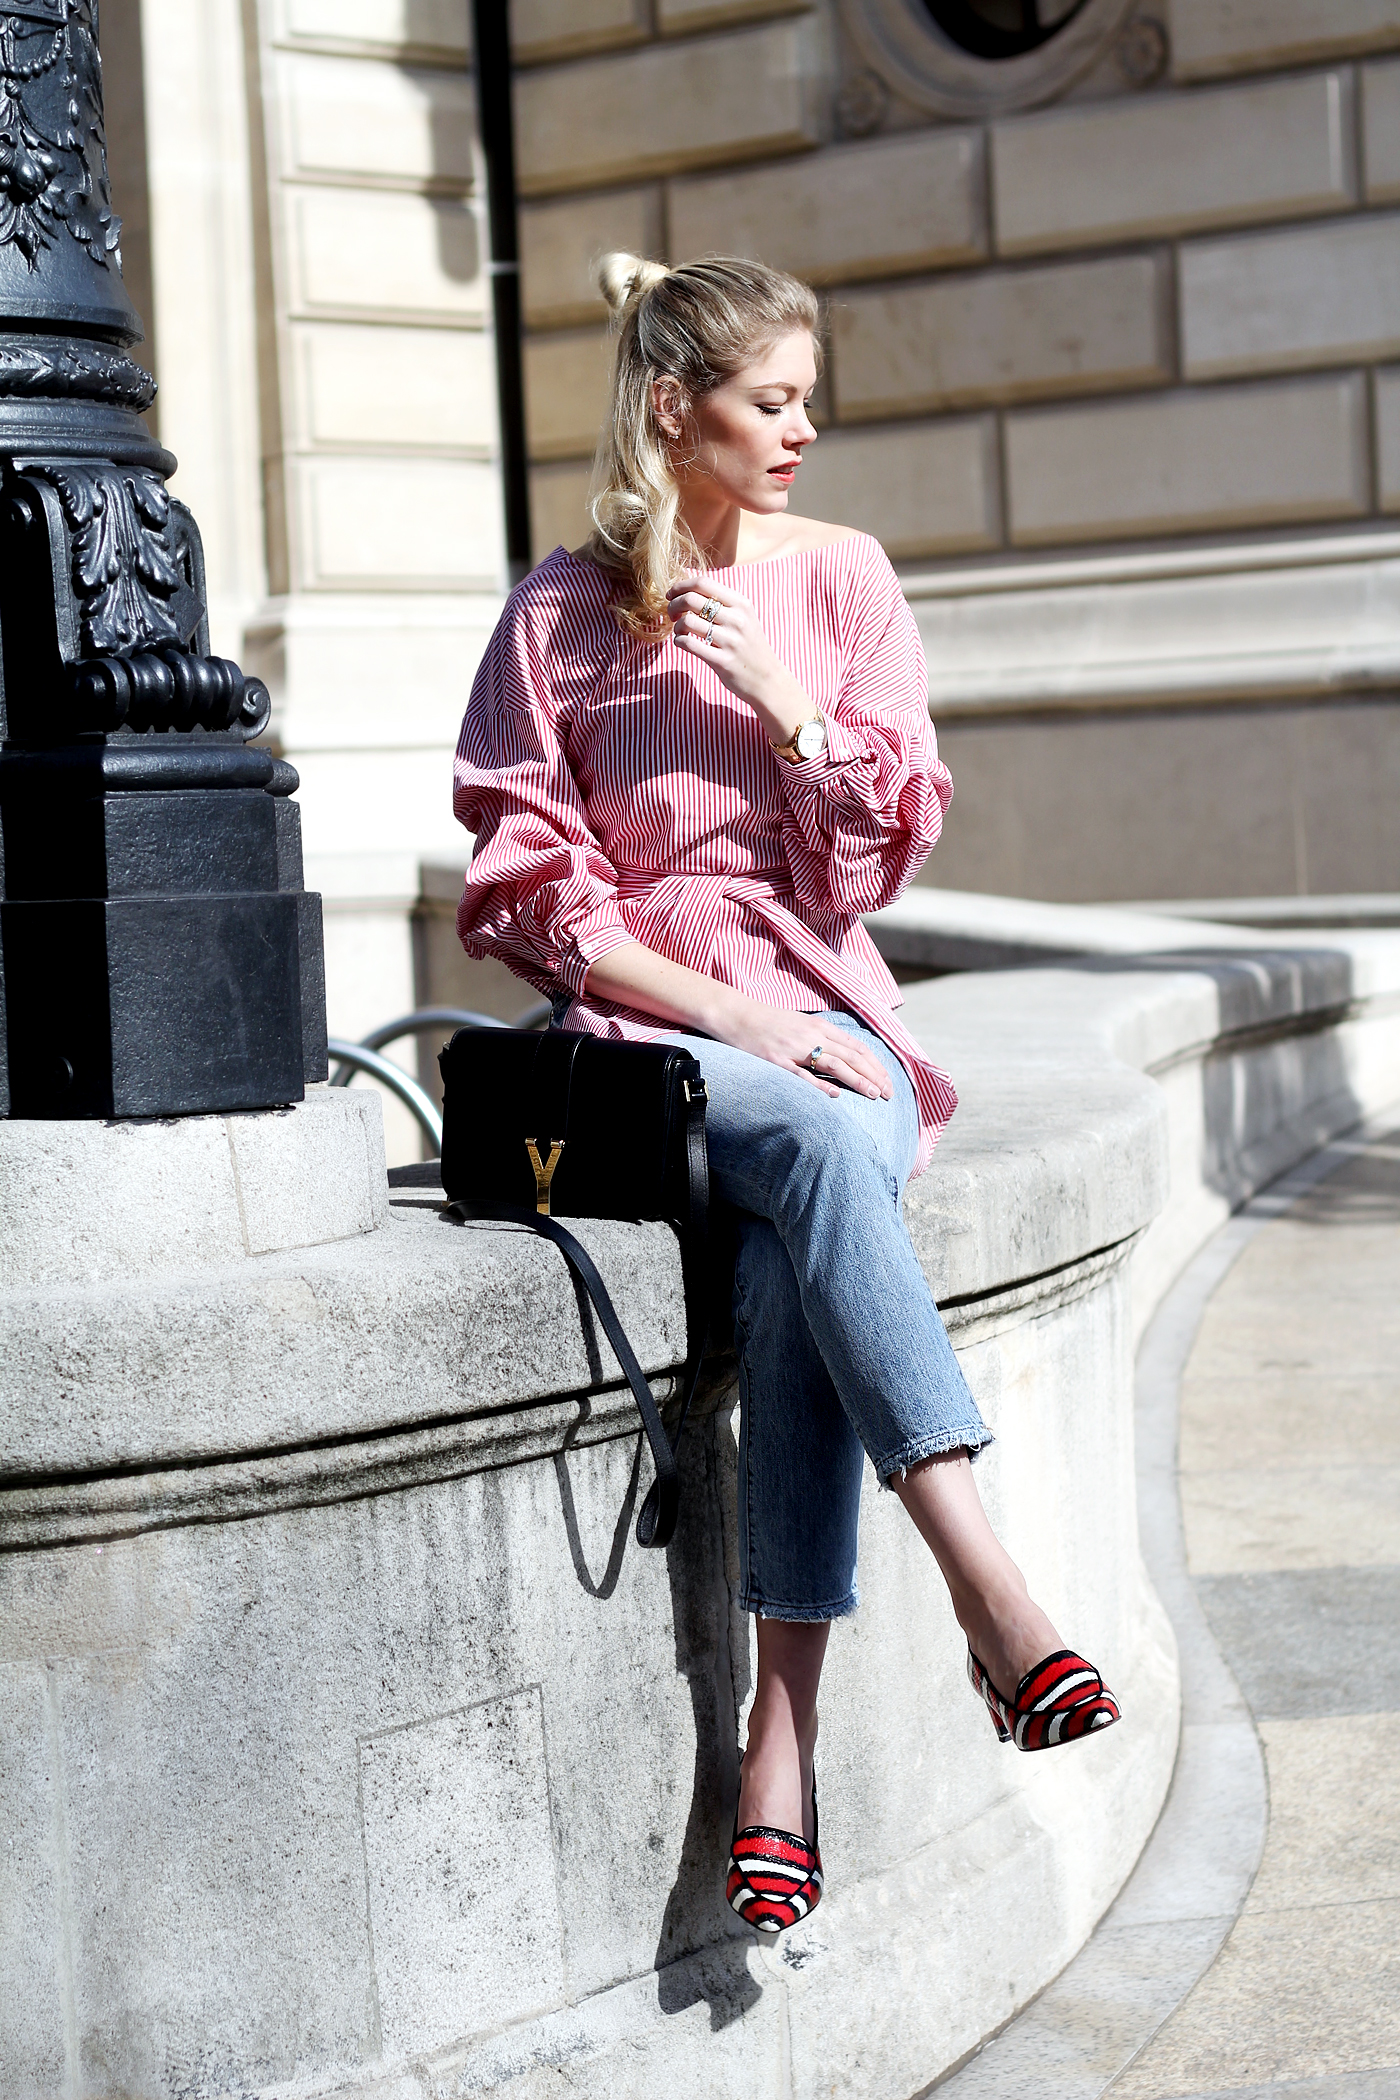 Zara_Wickelbluse_Ganni_shoes_somehappyshoes_VerenaJulia_streetstyle4